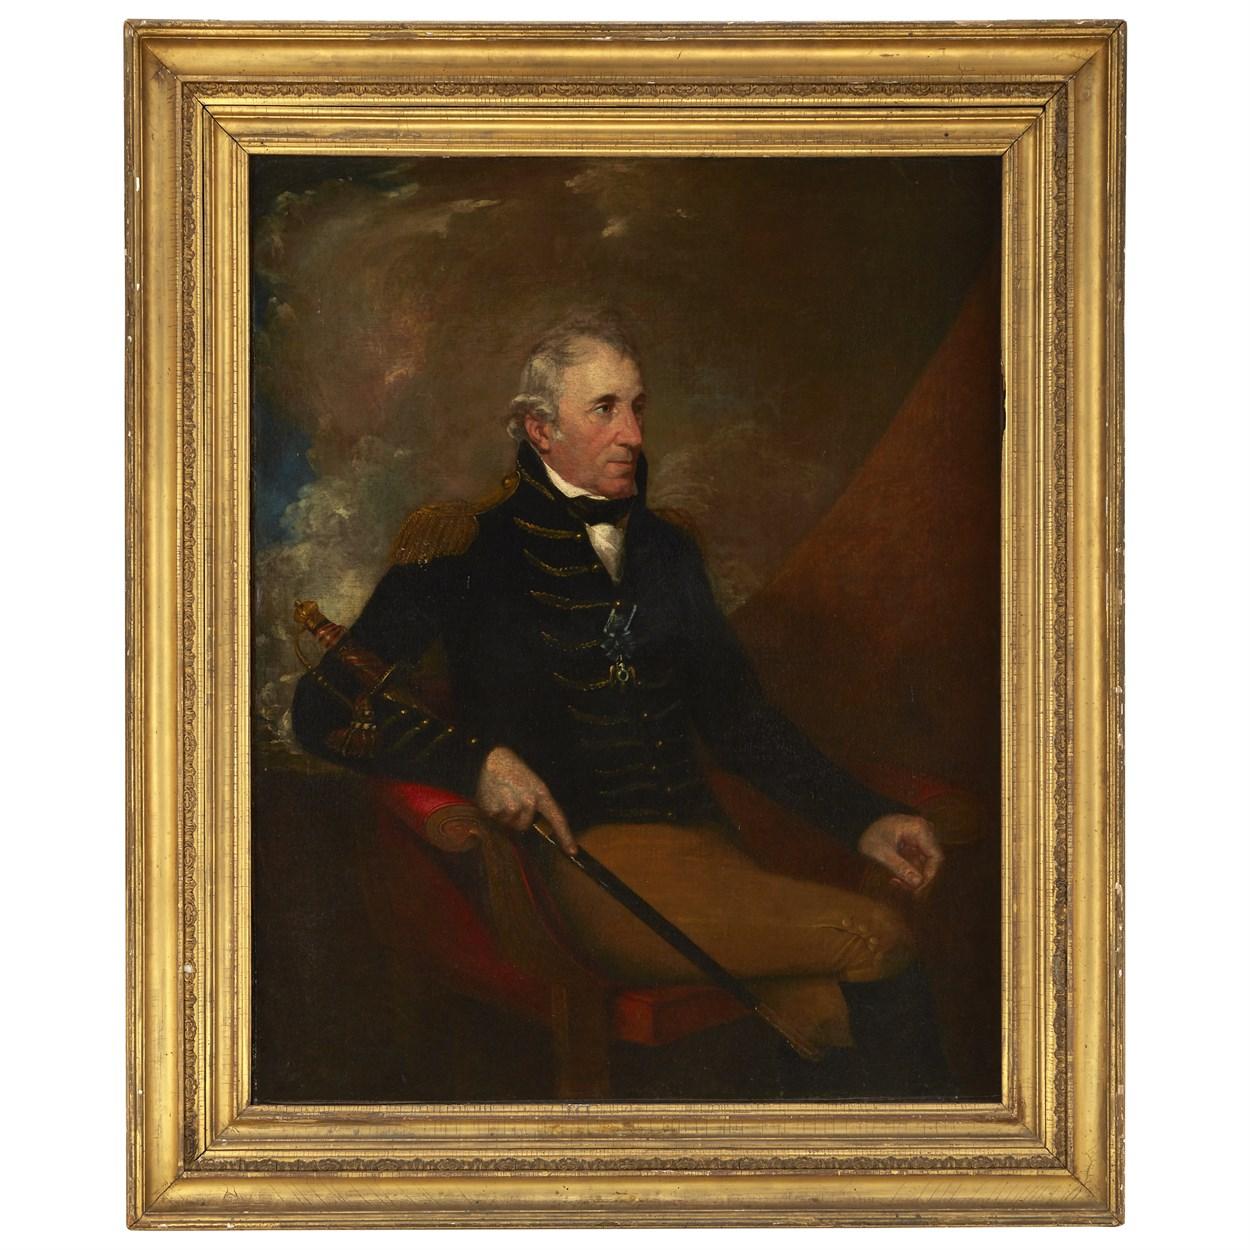 Lot 99 - Samuel Finley Breese Morse (1791-1828)